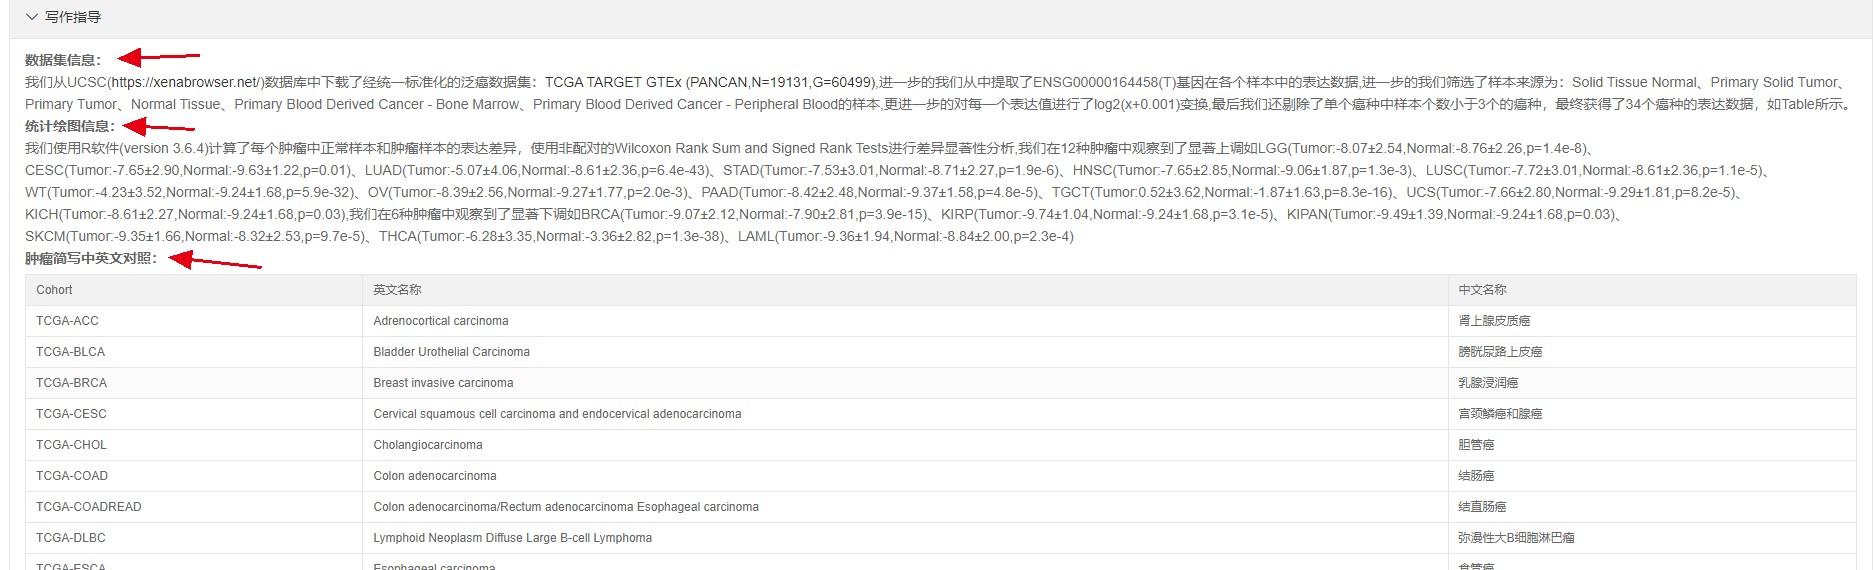 attachments-2021-07-rzYd9Fq560e1646d562cf.png